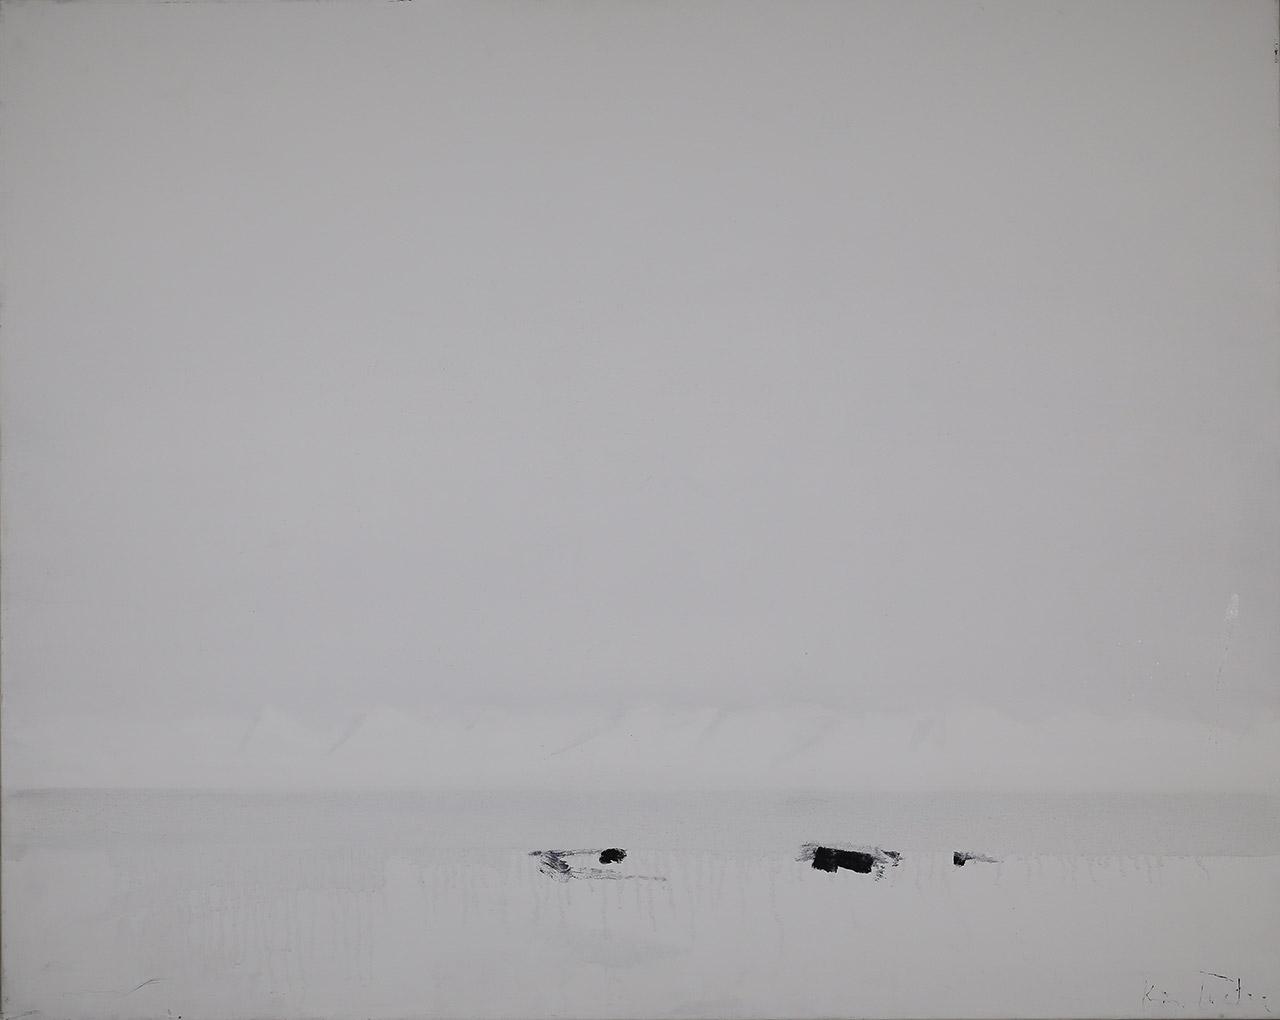 Isfjorden - Svalbard